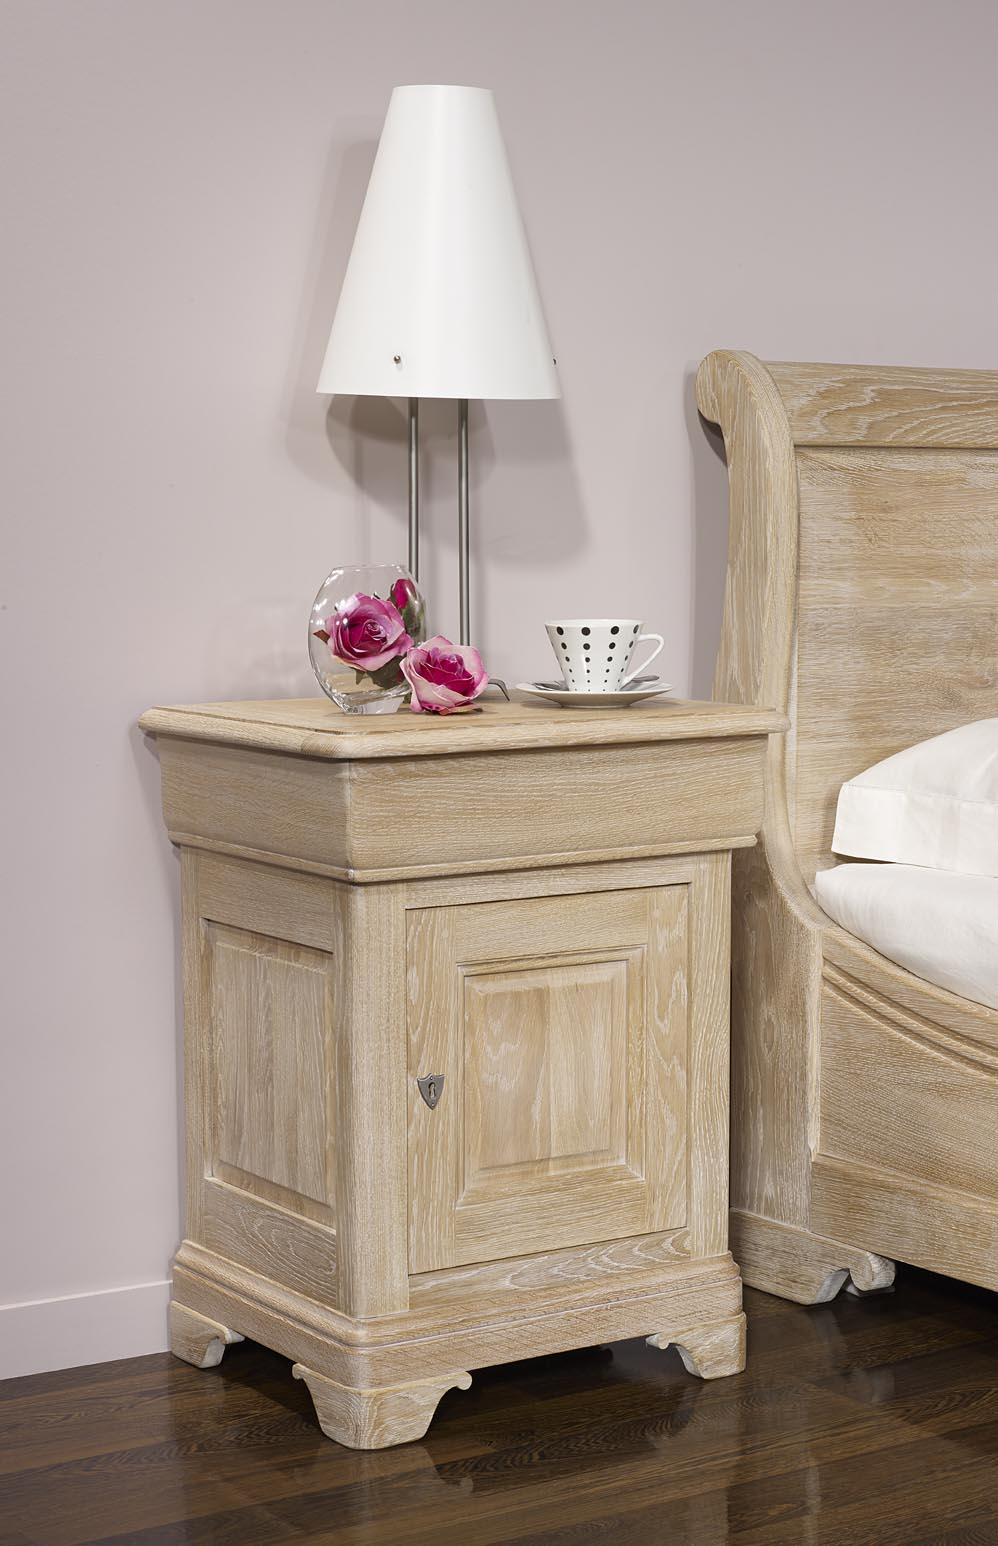 meuble en chne chevet hugo 1 porte 1 tiroir ralis en chne massif de style louis philippe. Black Bedroom Furniture Sets. Home Design Ideas